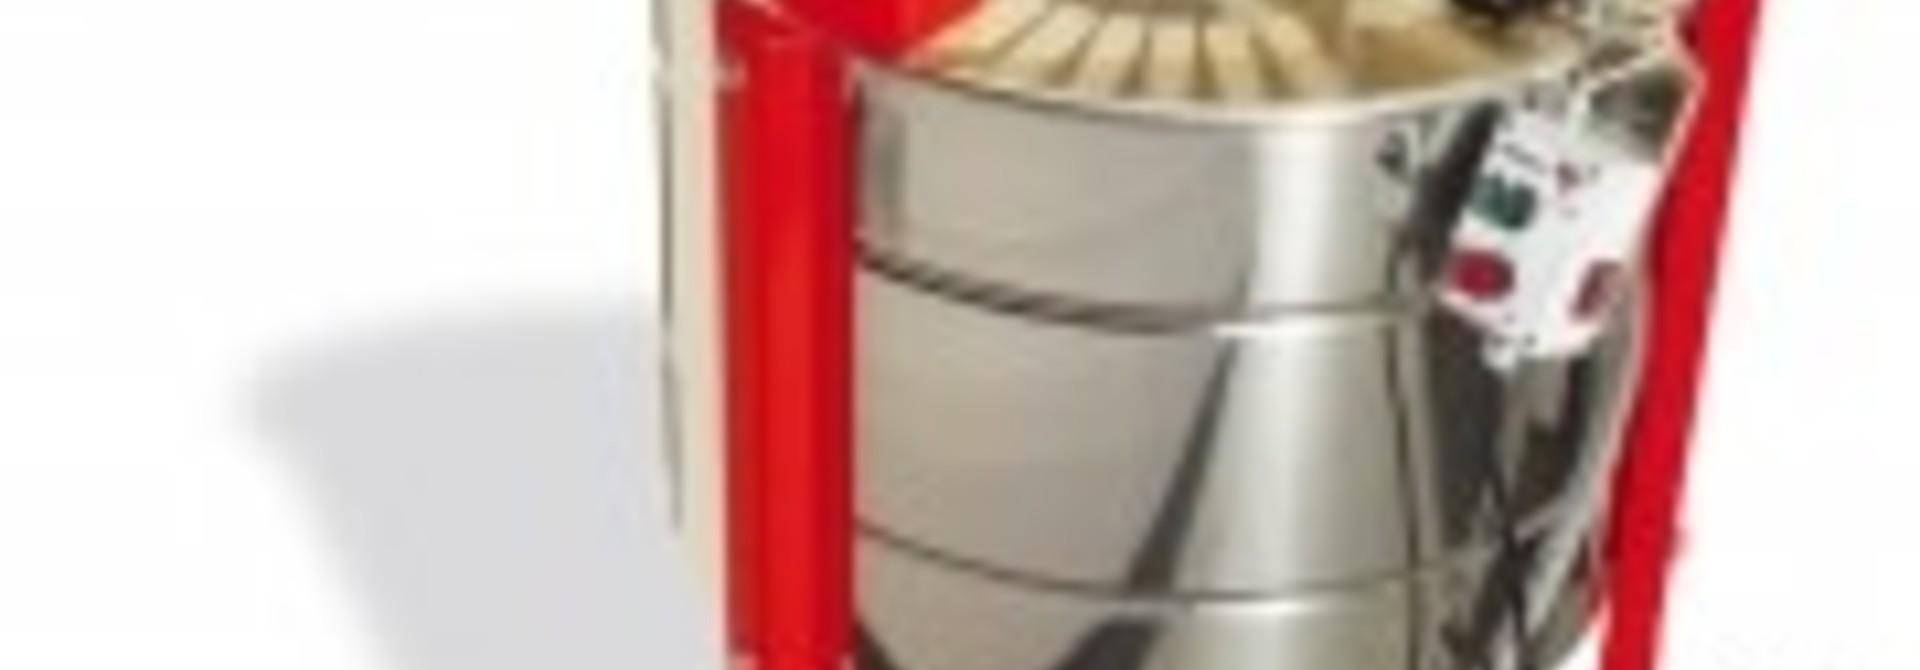 Honingslinger FLAMINGO 28 - elektrisch motor onderaan